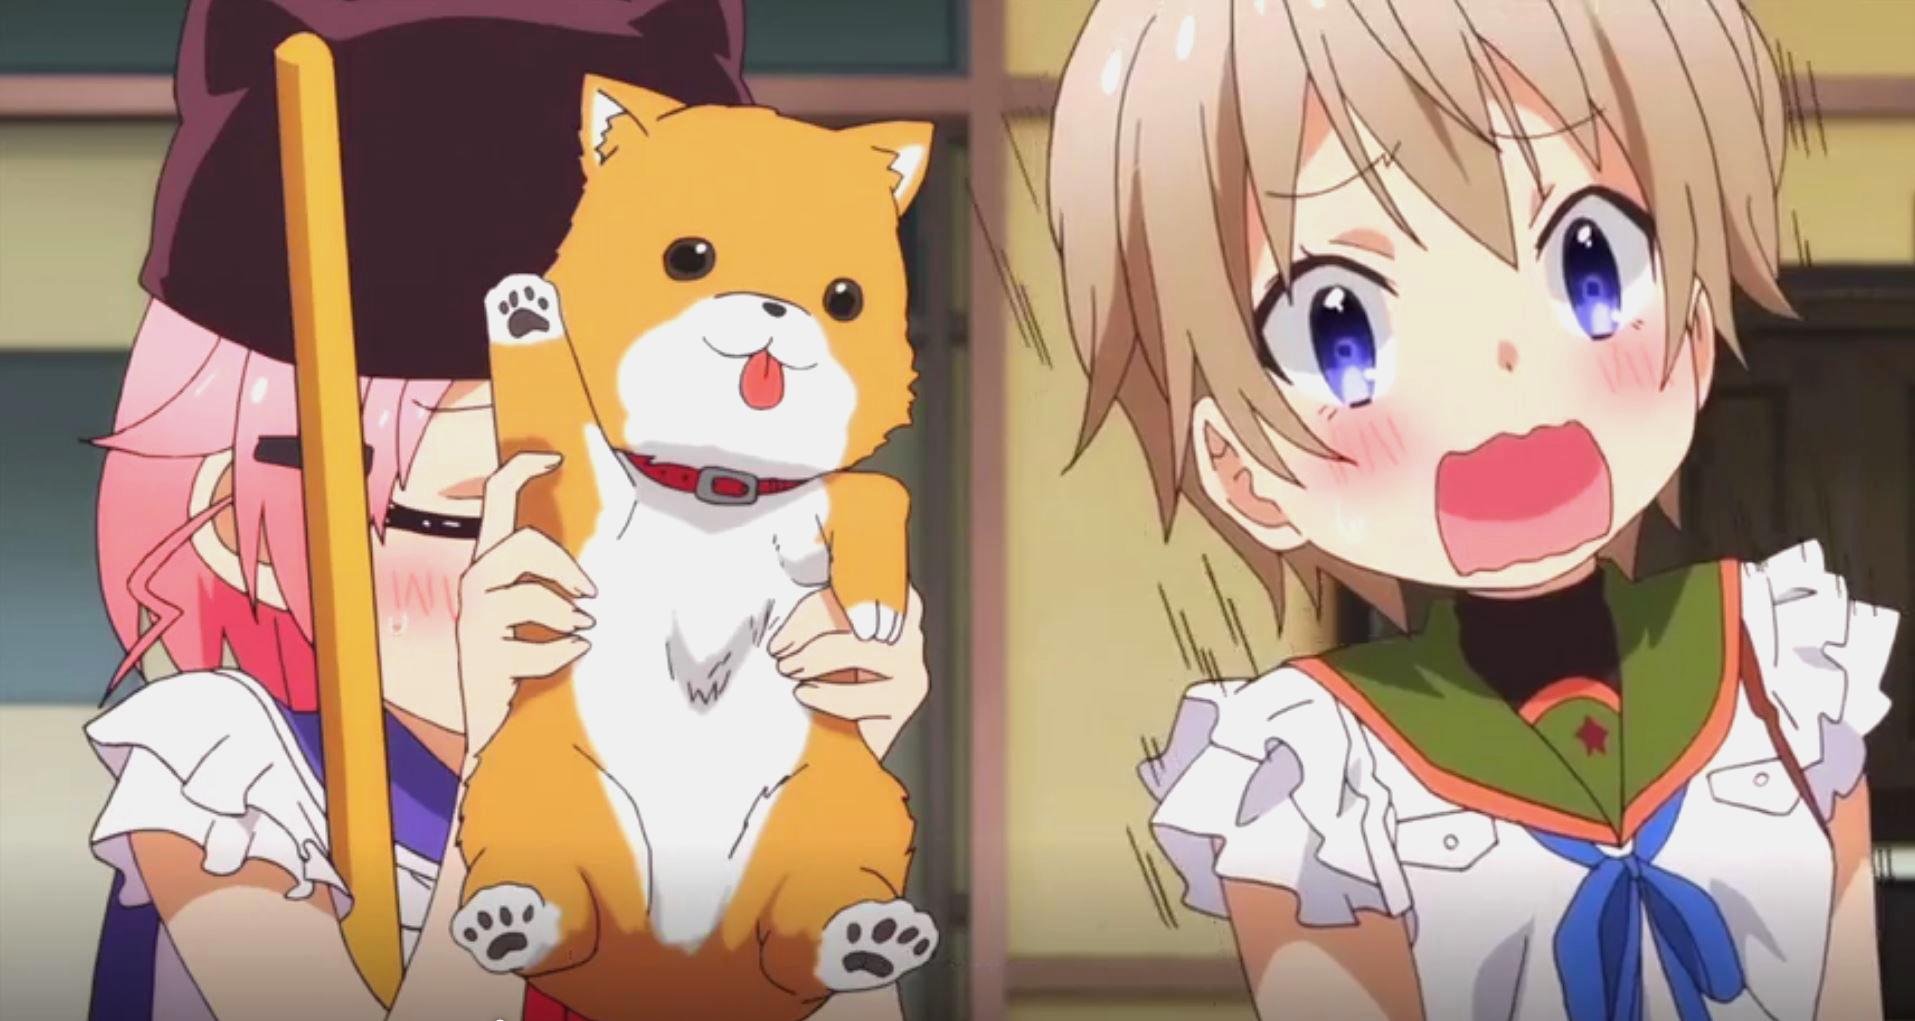 Extrait de l'épisode 9 de Gakkou Gurashi - Yuki, Tarômaru et Miki.